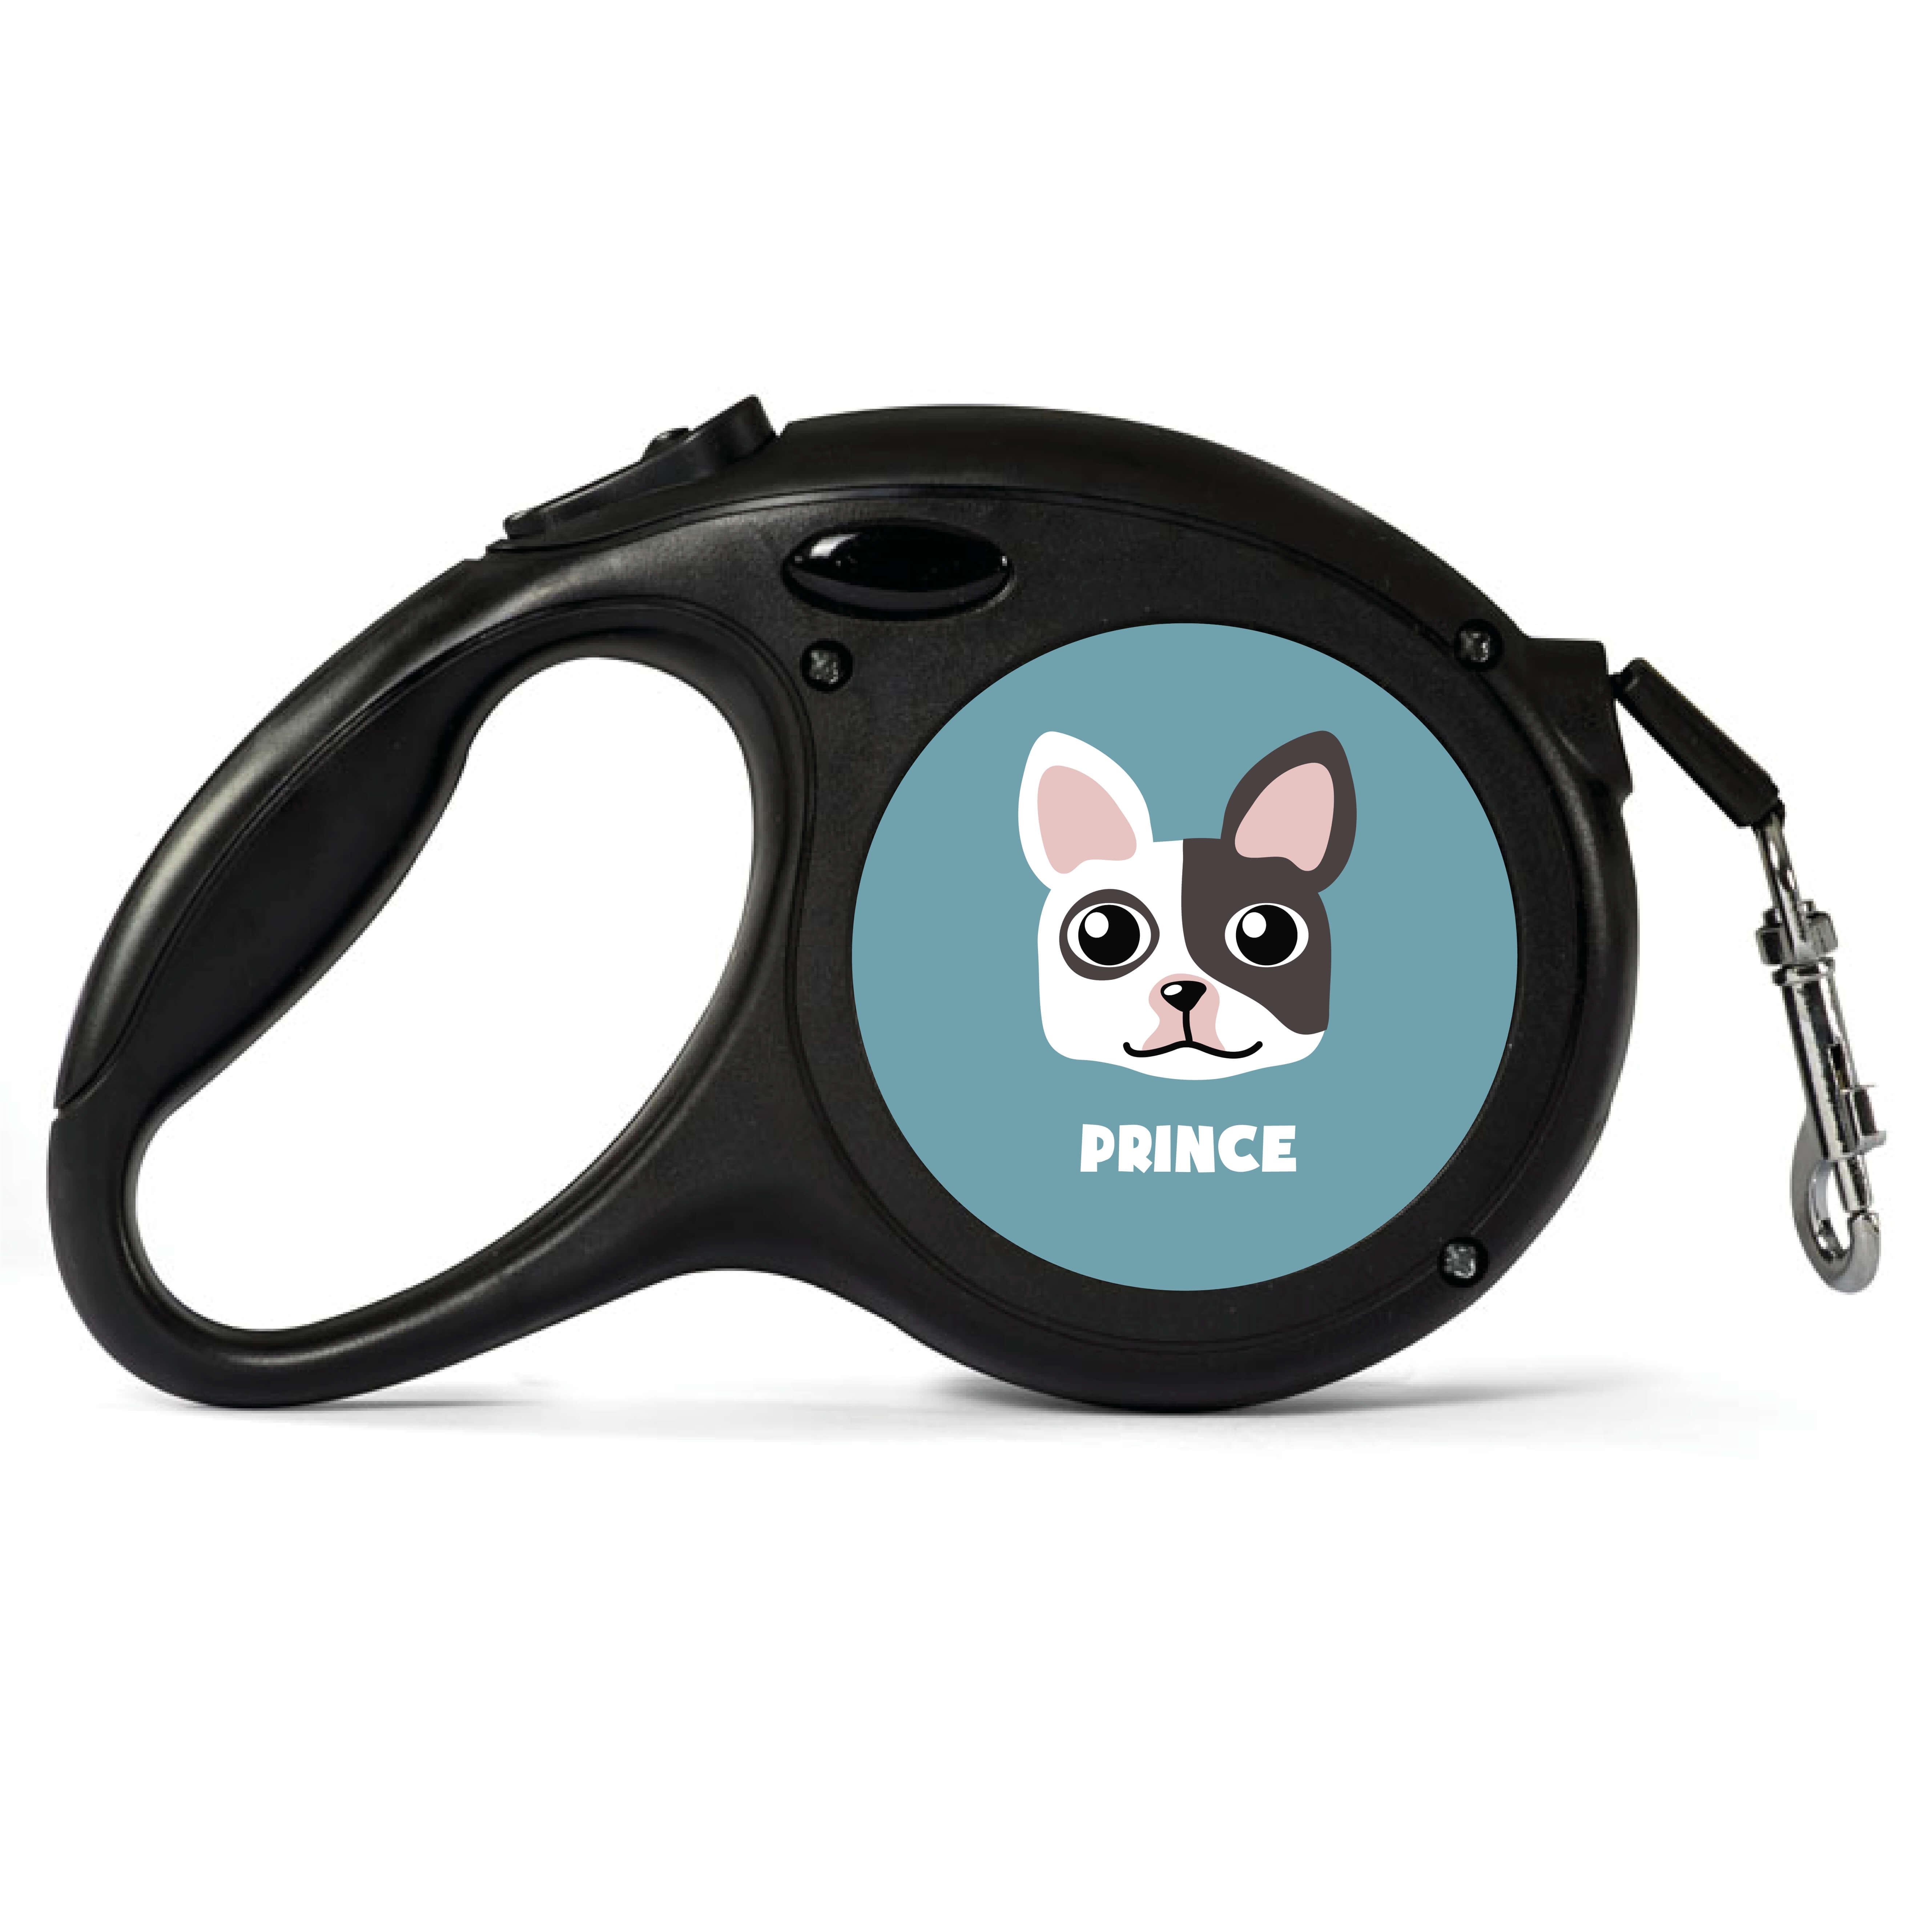 Personalised White & Black French Bulldog Retractable Dog Lead - Large